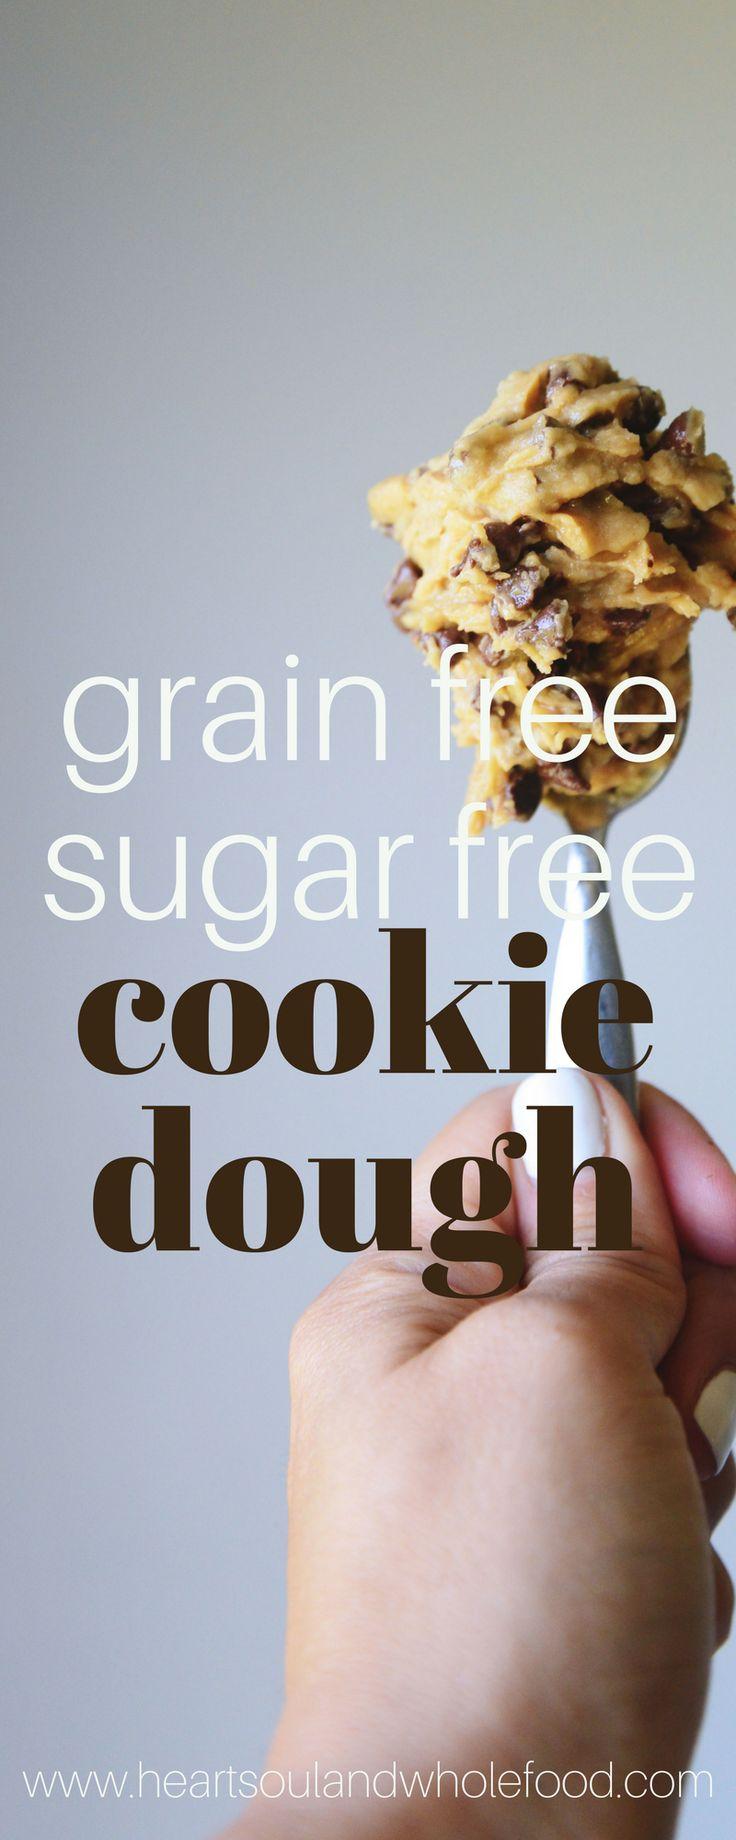 This grain free sugar free cookie dough recipe is amazing. Gluten free cookie dough recipe. Egg free cookie dough recipe.